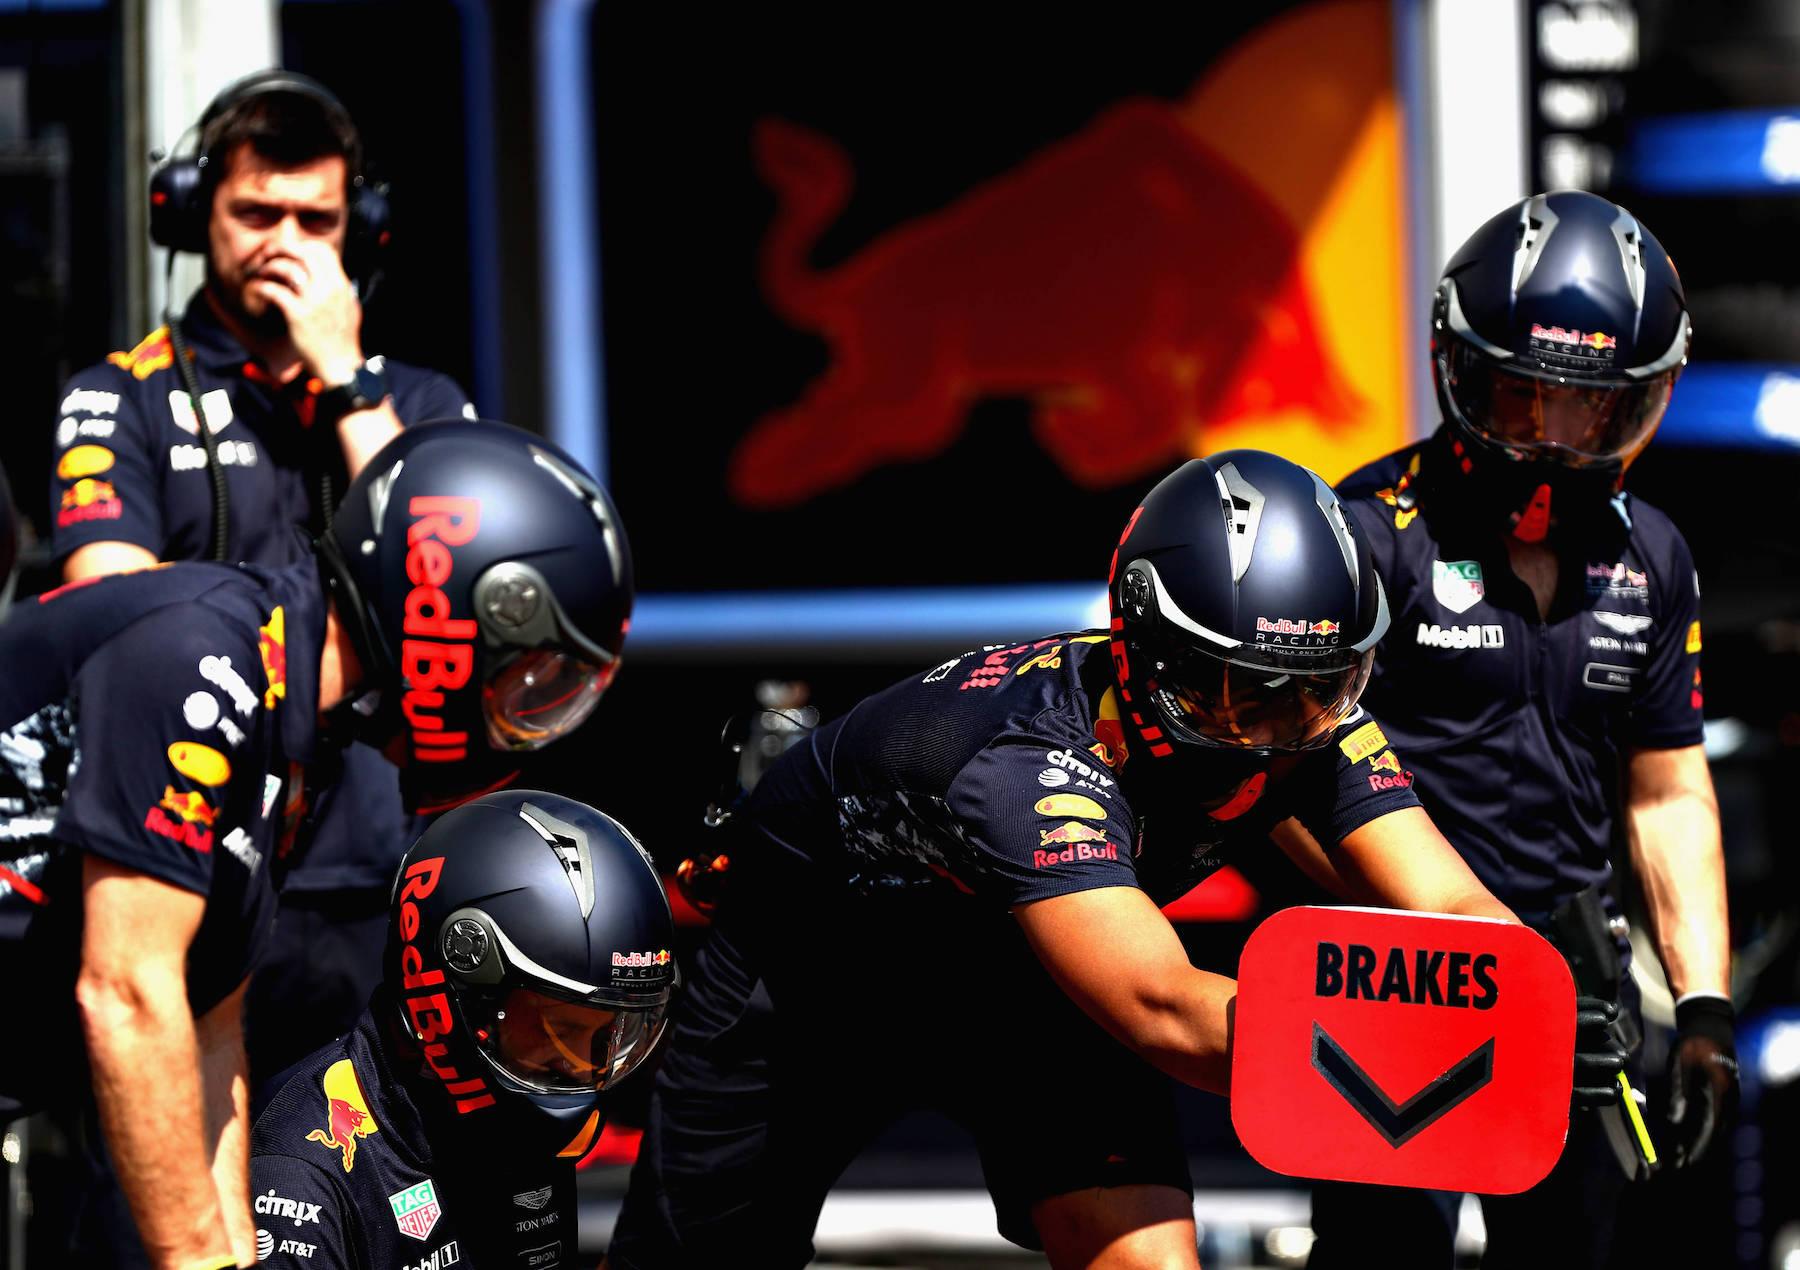 2017 Red Bull mechanics Pit stop practice copy.jpg